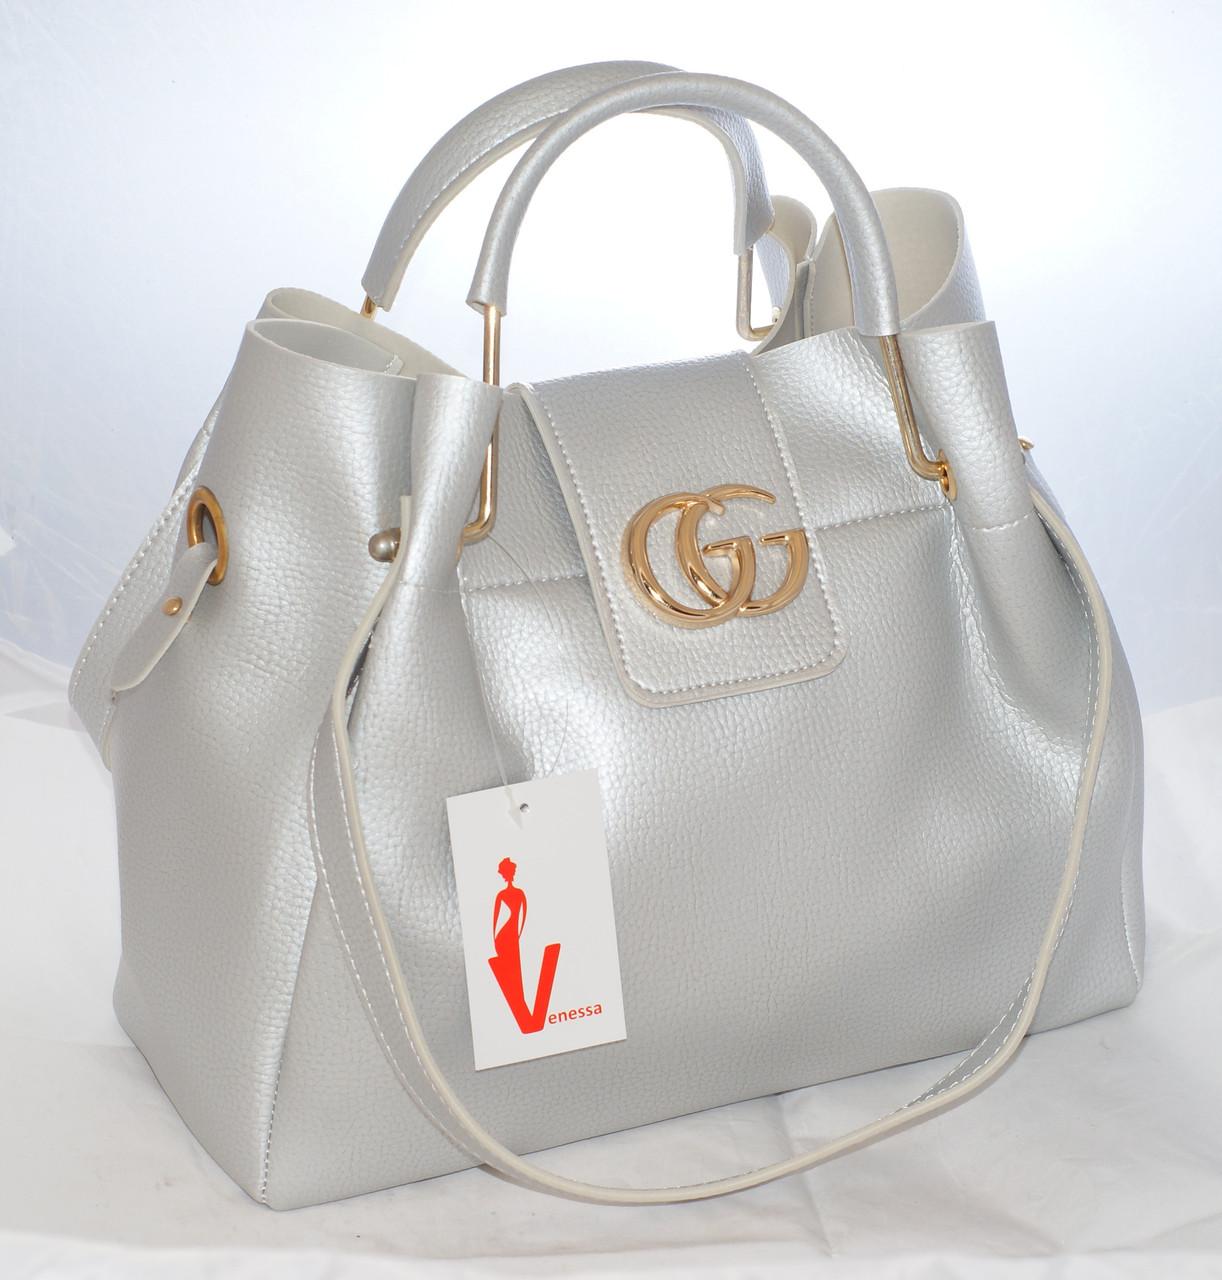 21d2b0b770a0 женская сумка Gucci гуччи серебристая с косметичкой продажа